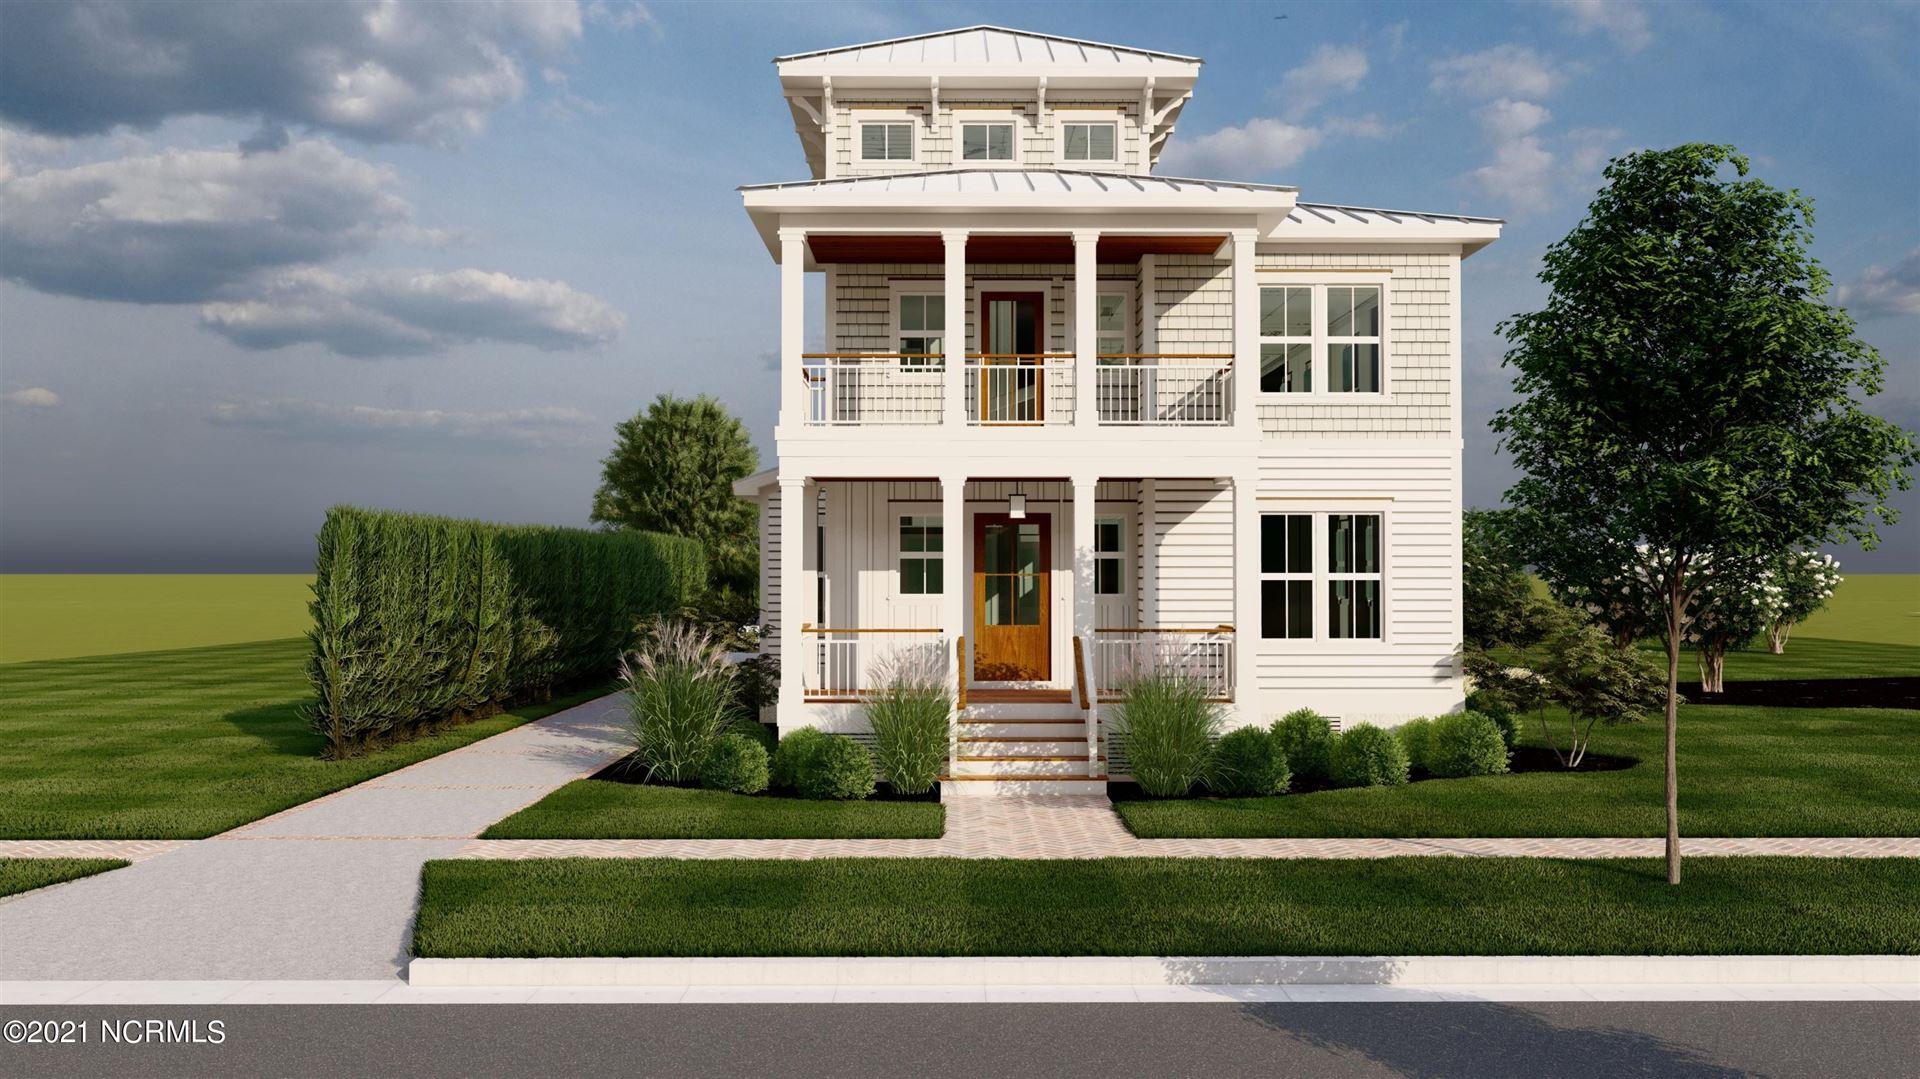 Photo for 3758 Pergola Terrace, Wilmington, NC 28403 (MLS # 100267633)